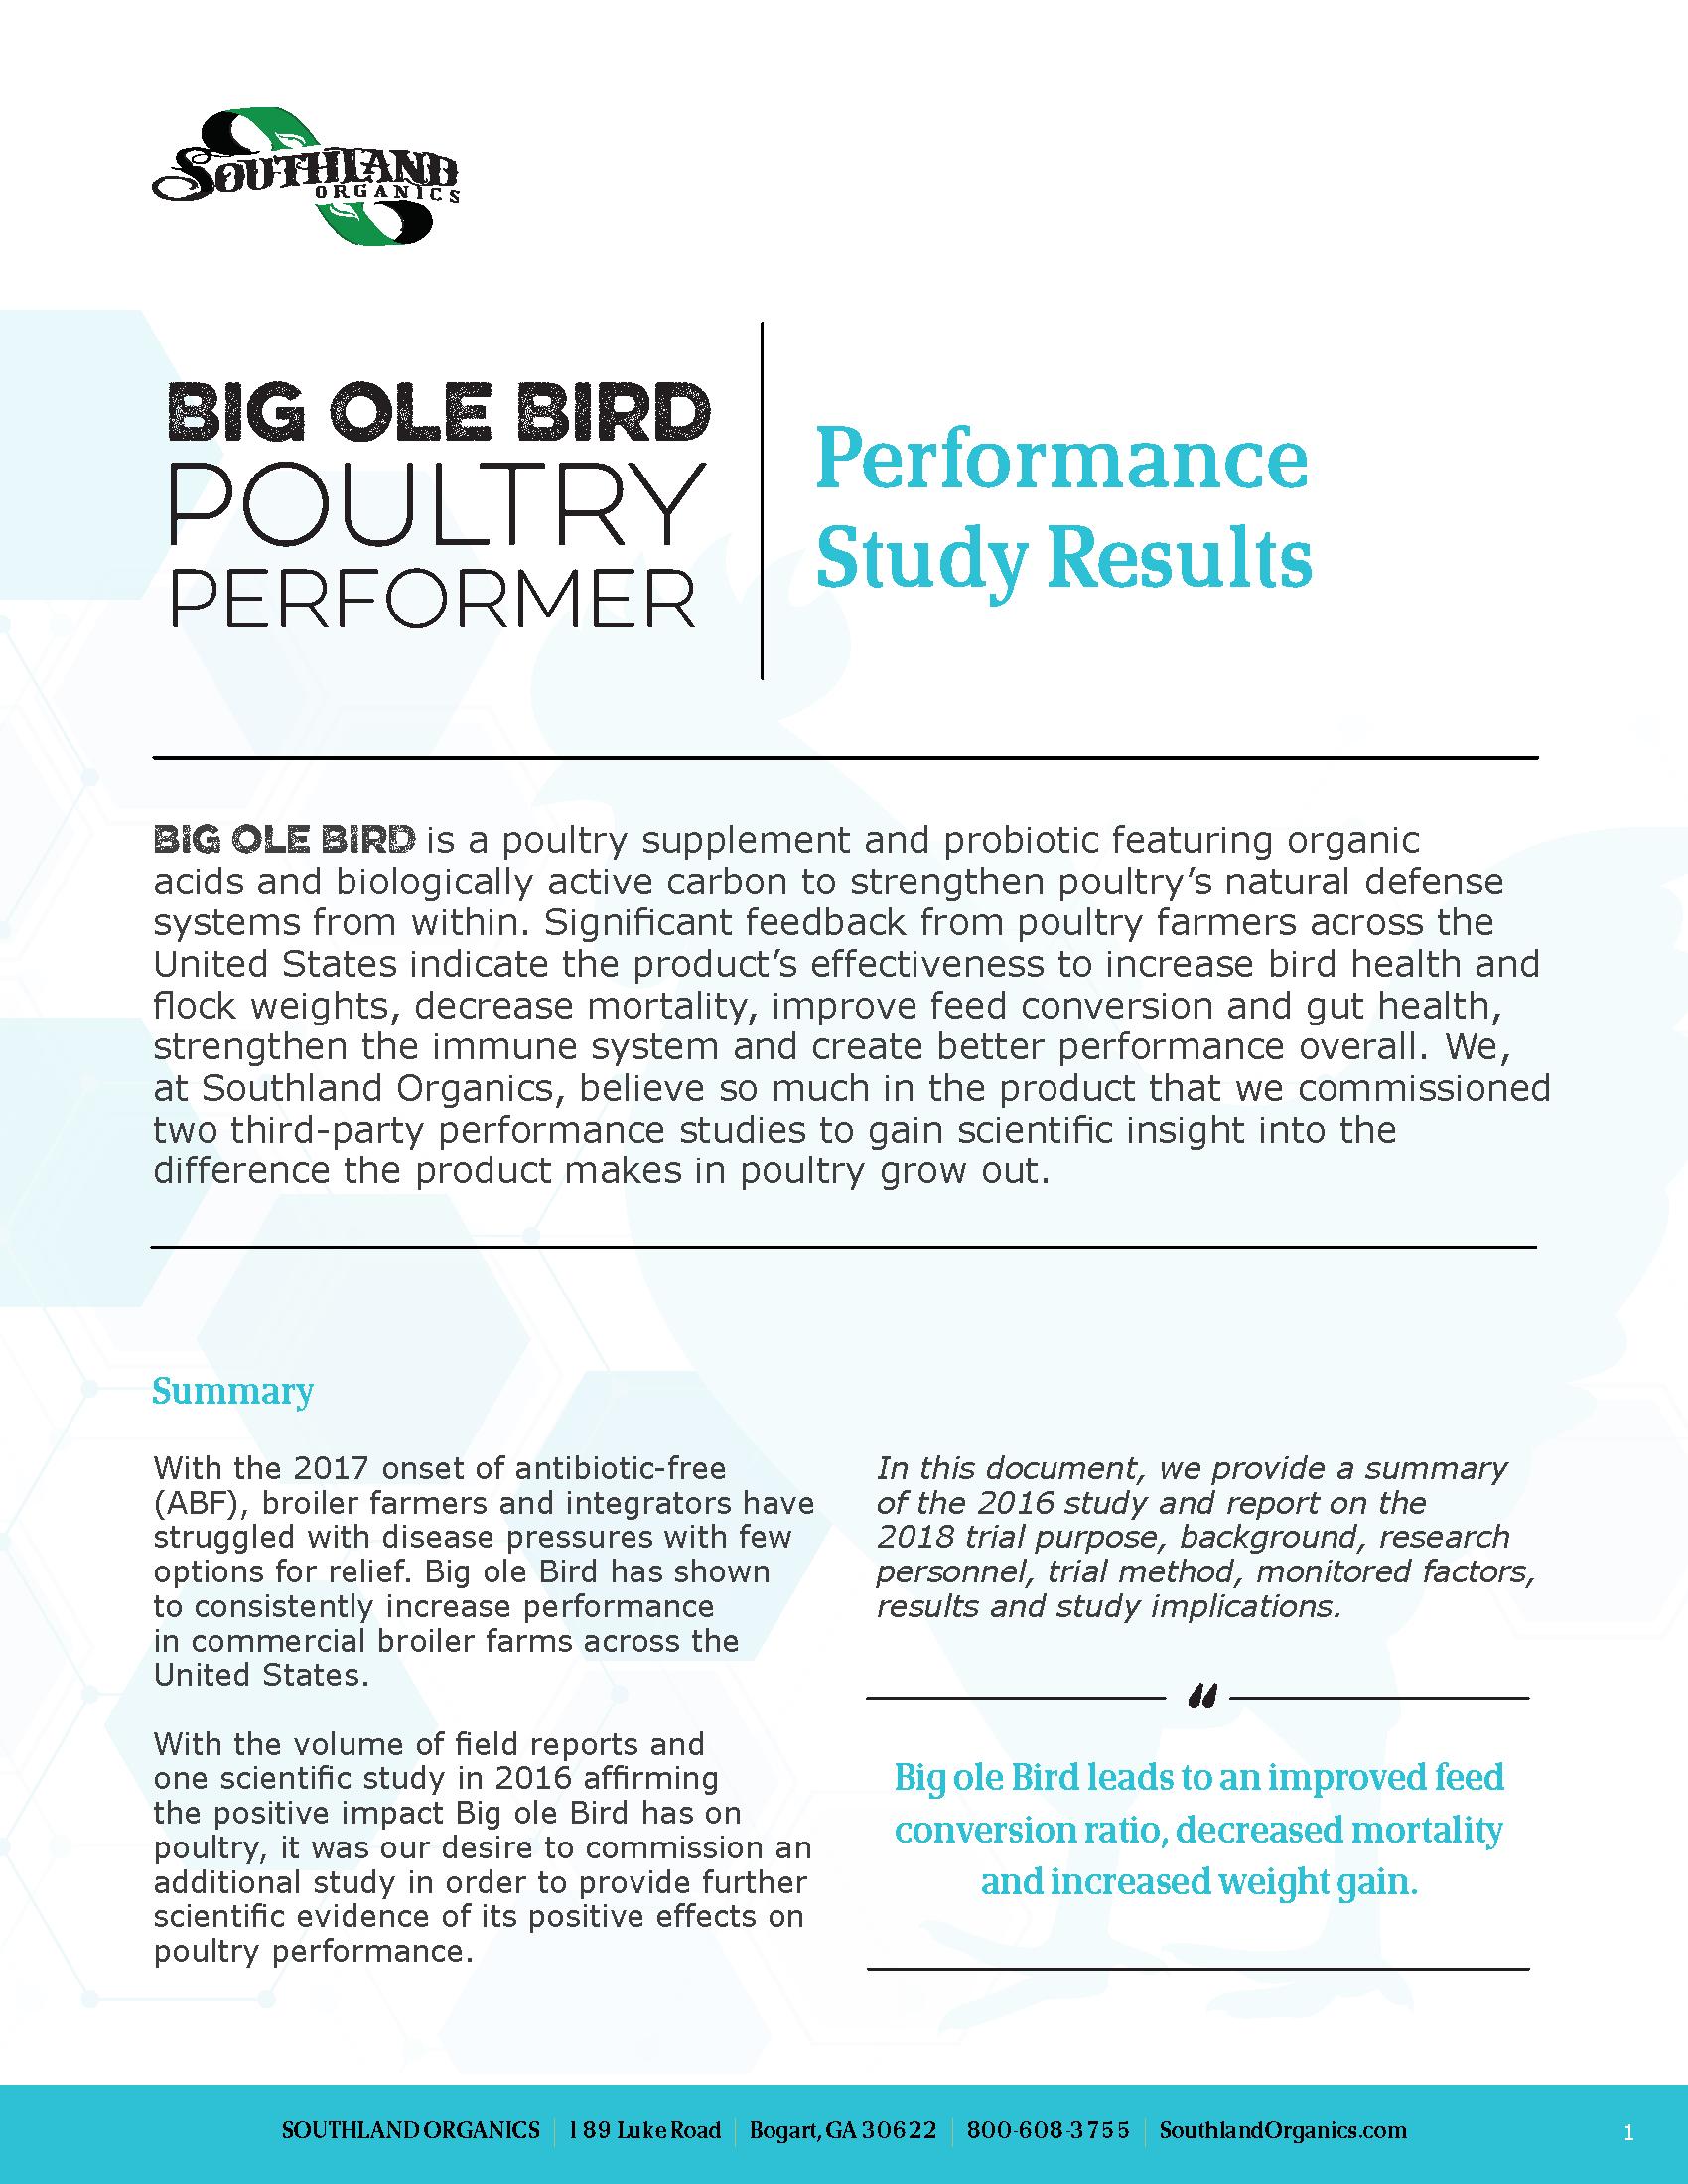 Increased Broiler Performance